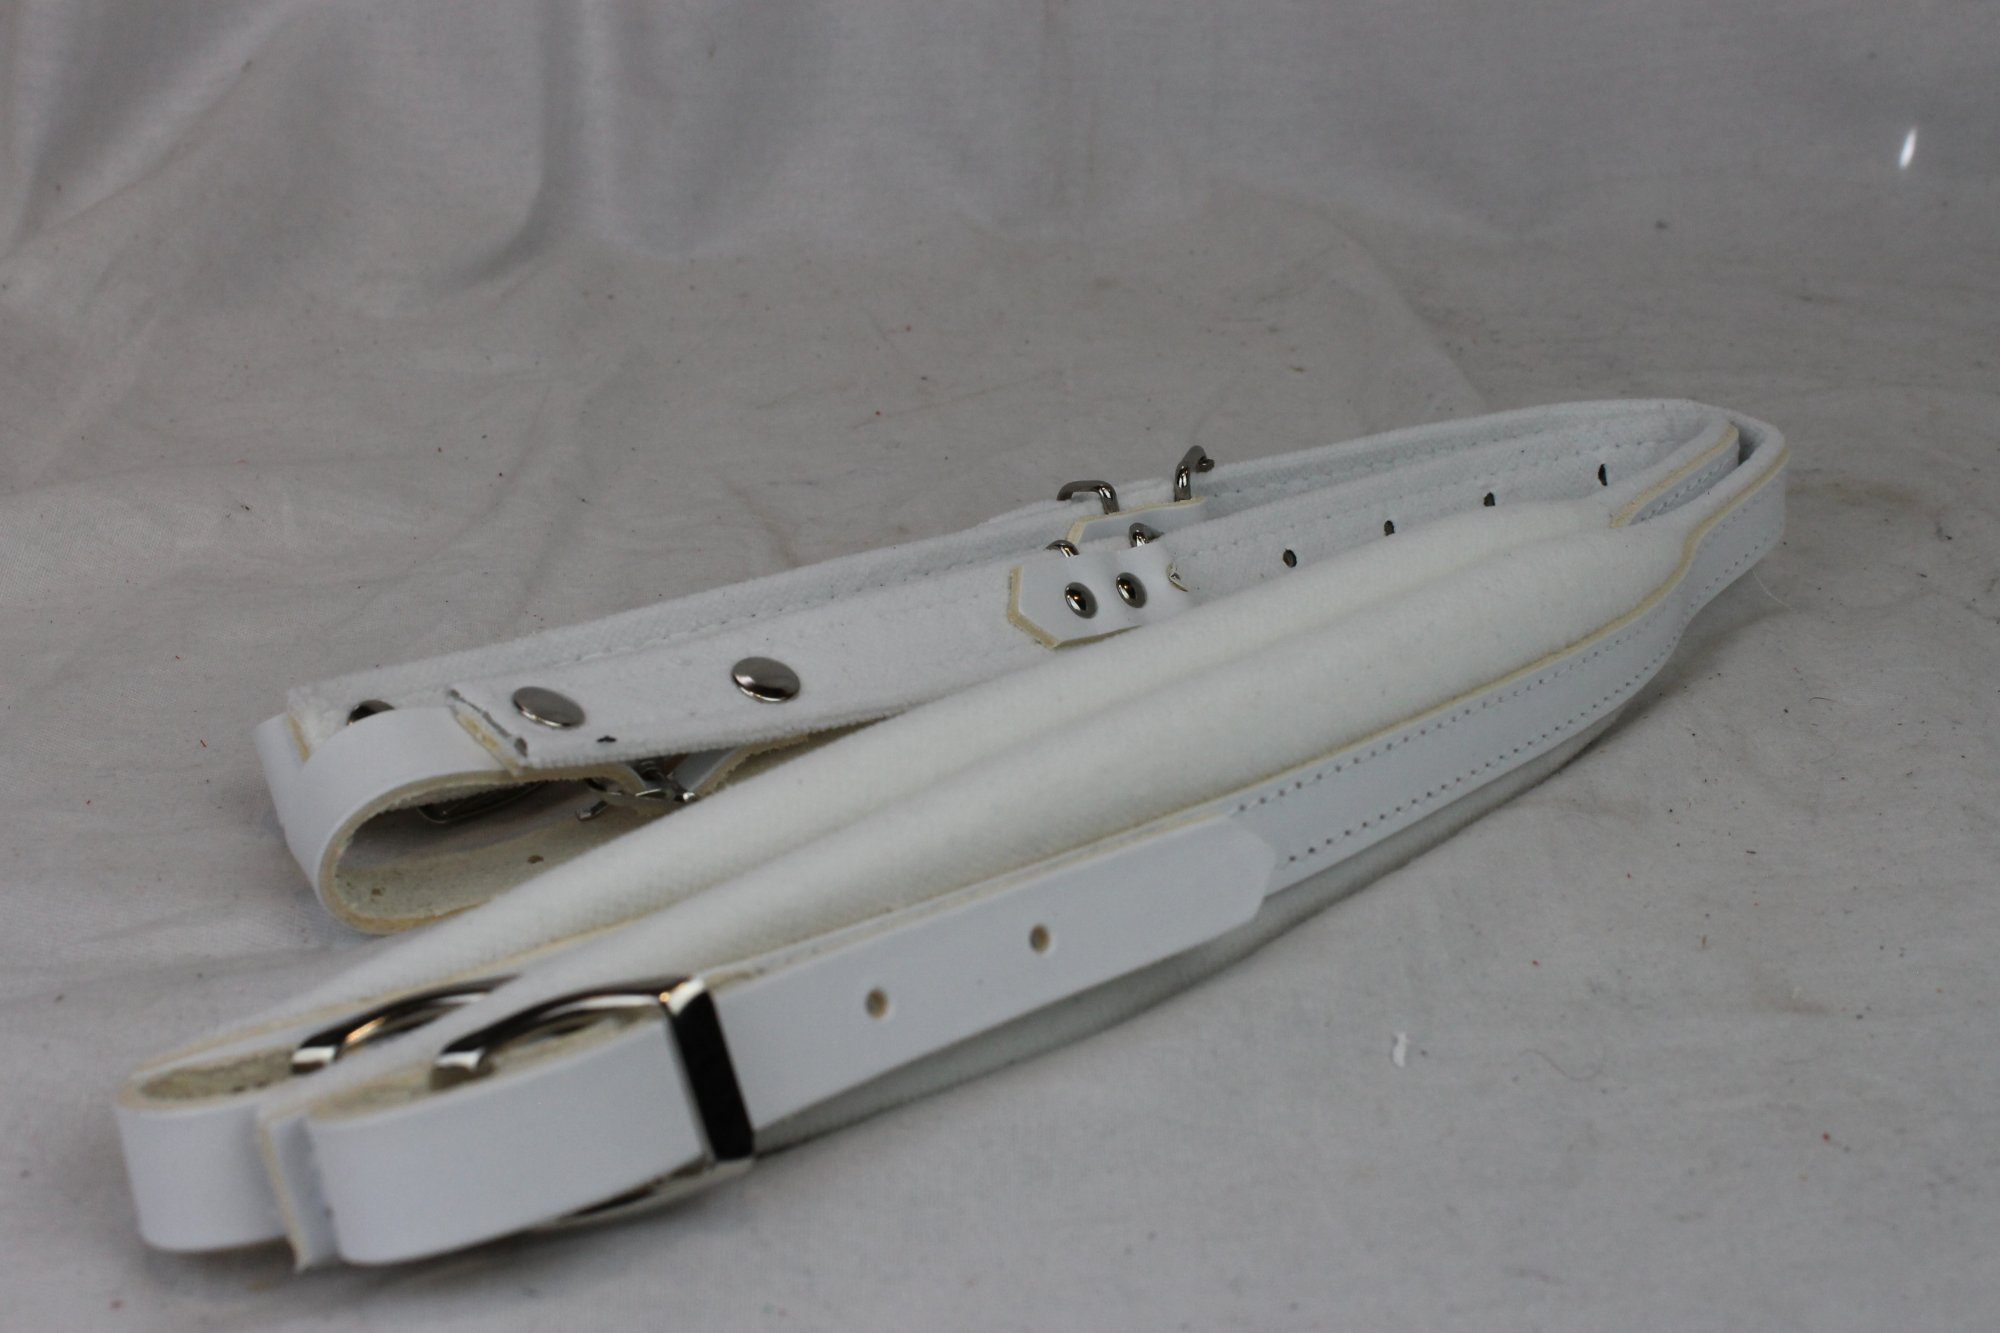 New White Leather Velour Fuselli Accordion Shoulder Straps Width (4.5 cm / 1.8 inch) Length (57cm-76cm / 22.4-29.9)